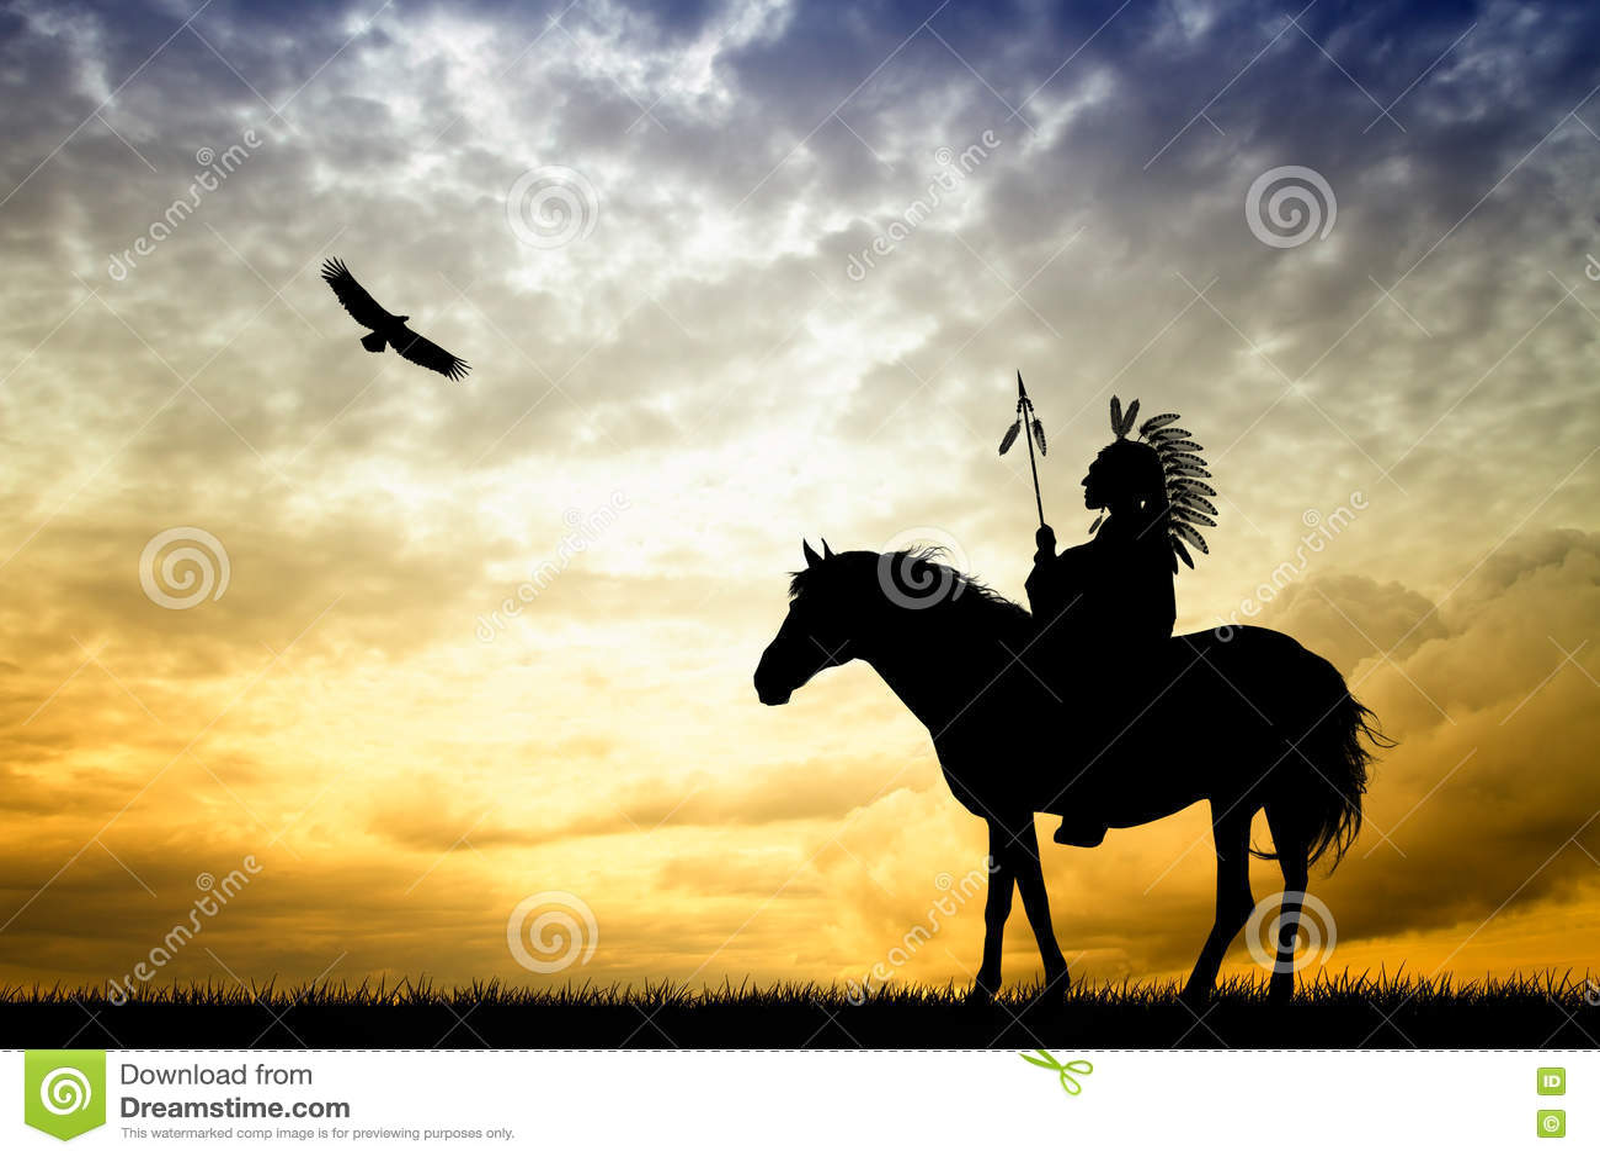 Native American Indian On Horse Stock Illustration Illustration Of Native Sunset 80750868